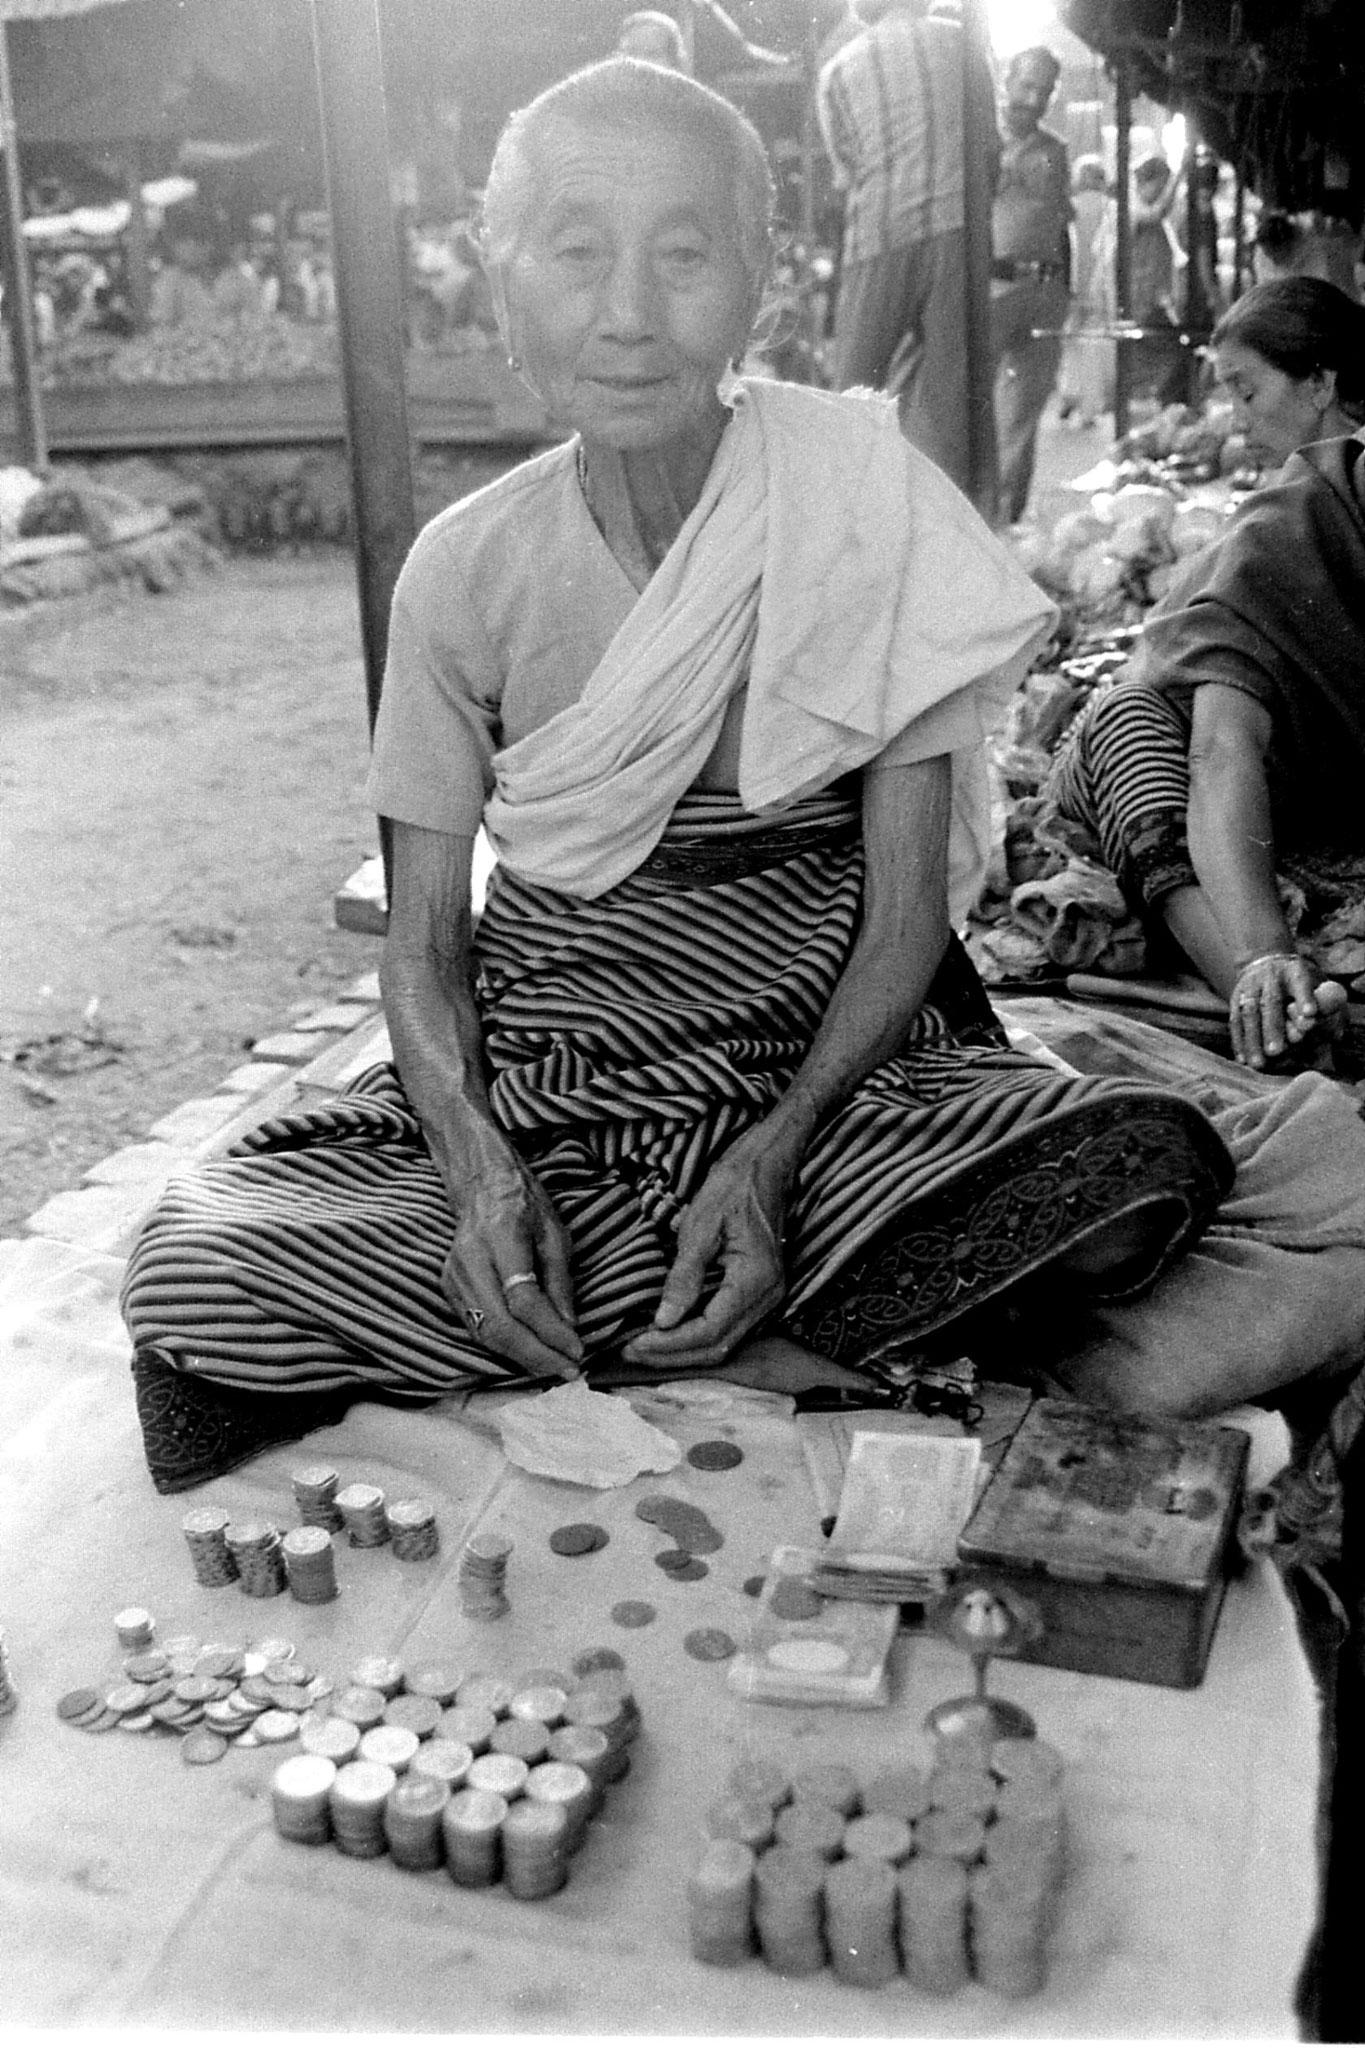 17/4/1990: 6: Imphal women's market